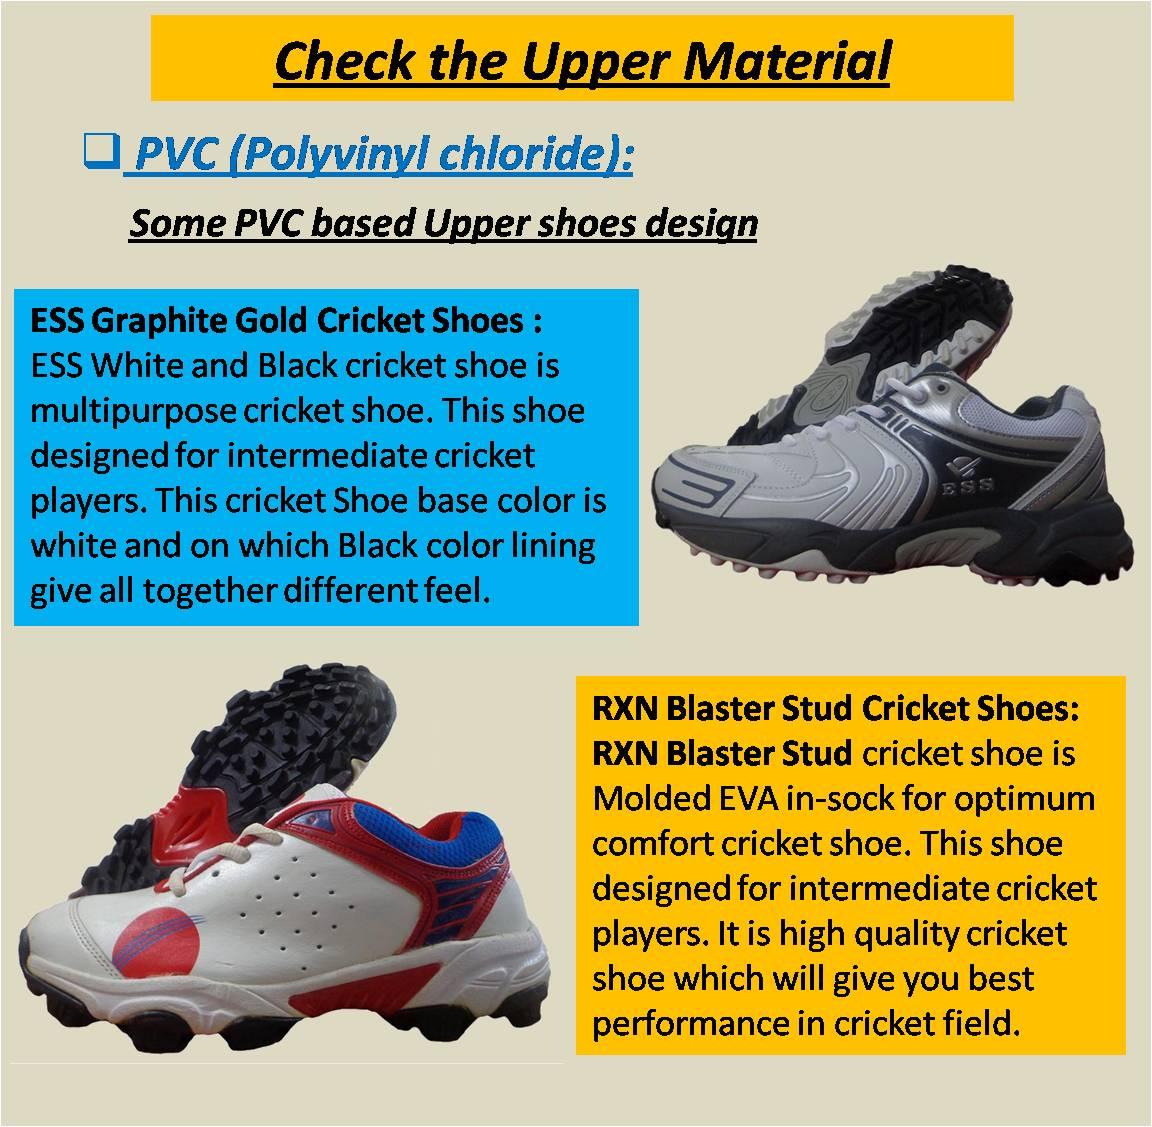 PVC Upper Material 6